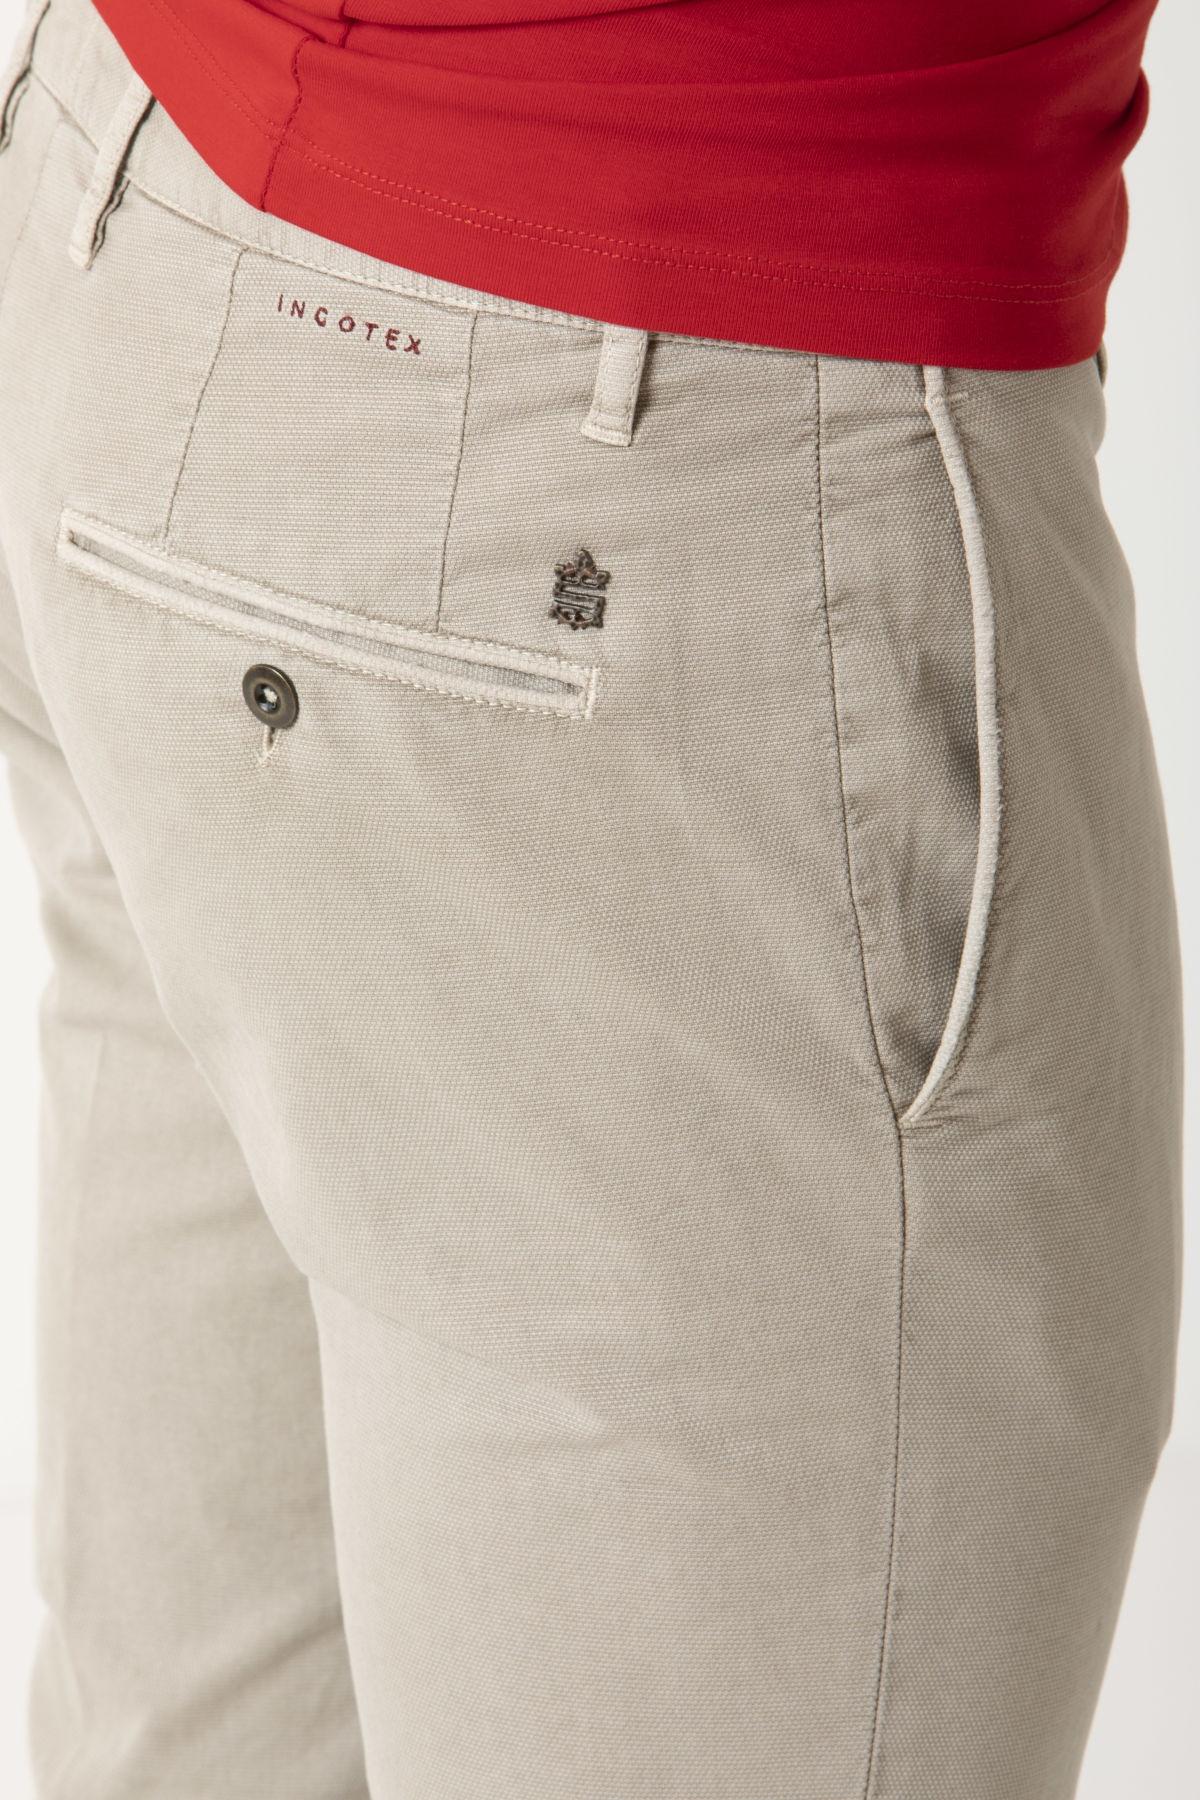 Pantaloni per uomo INCOTEX P/E 19